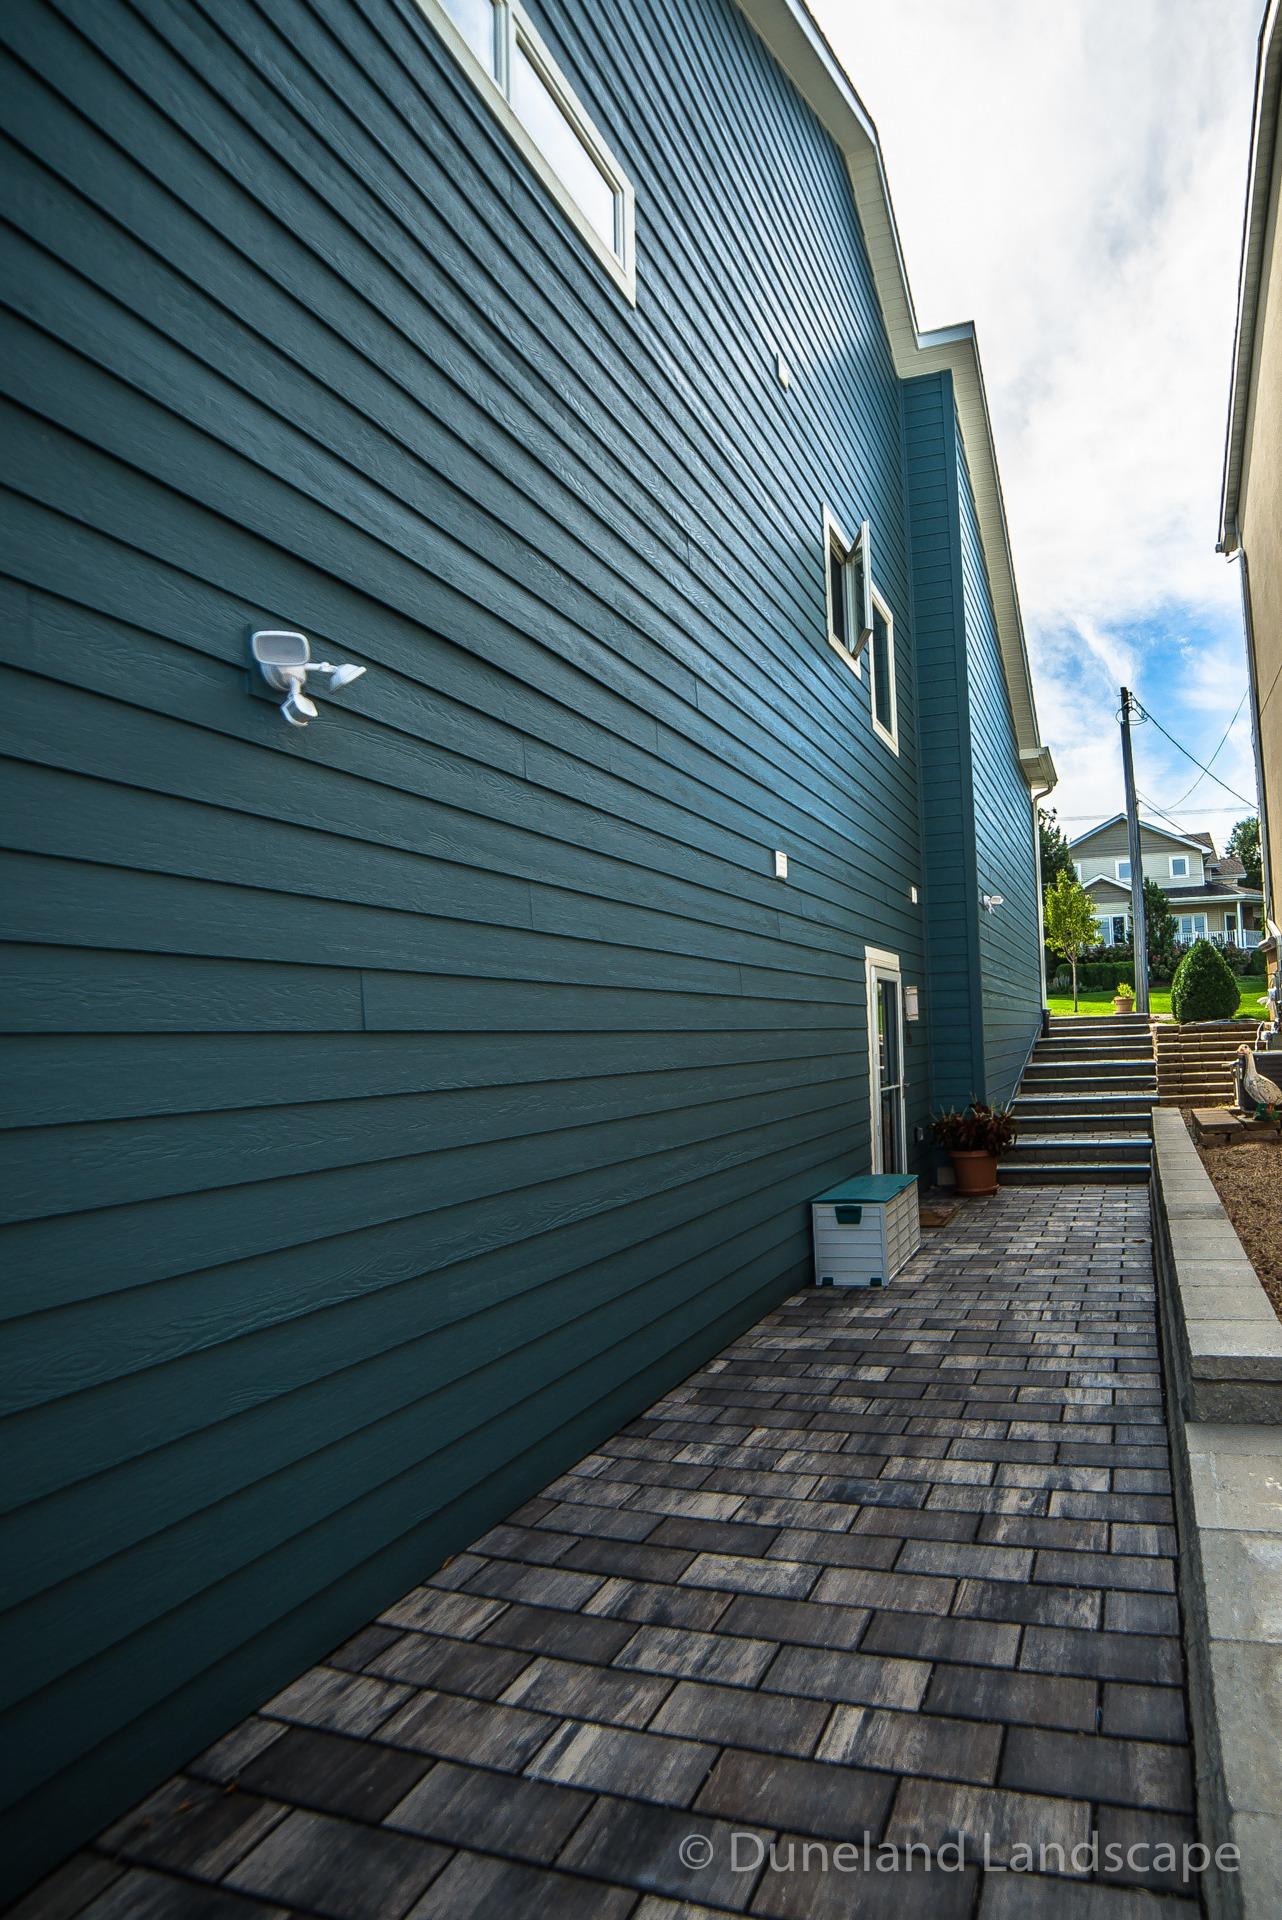 brick sidewalk pavers alongside house